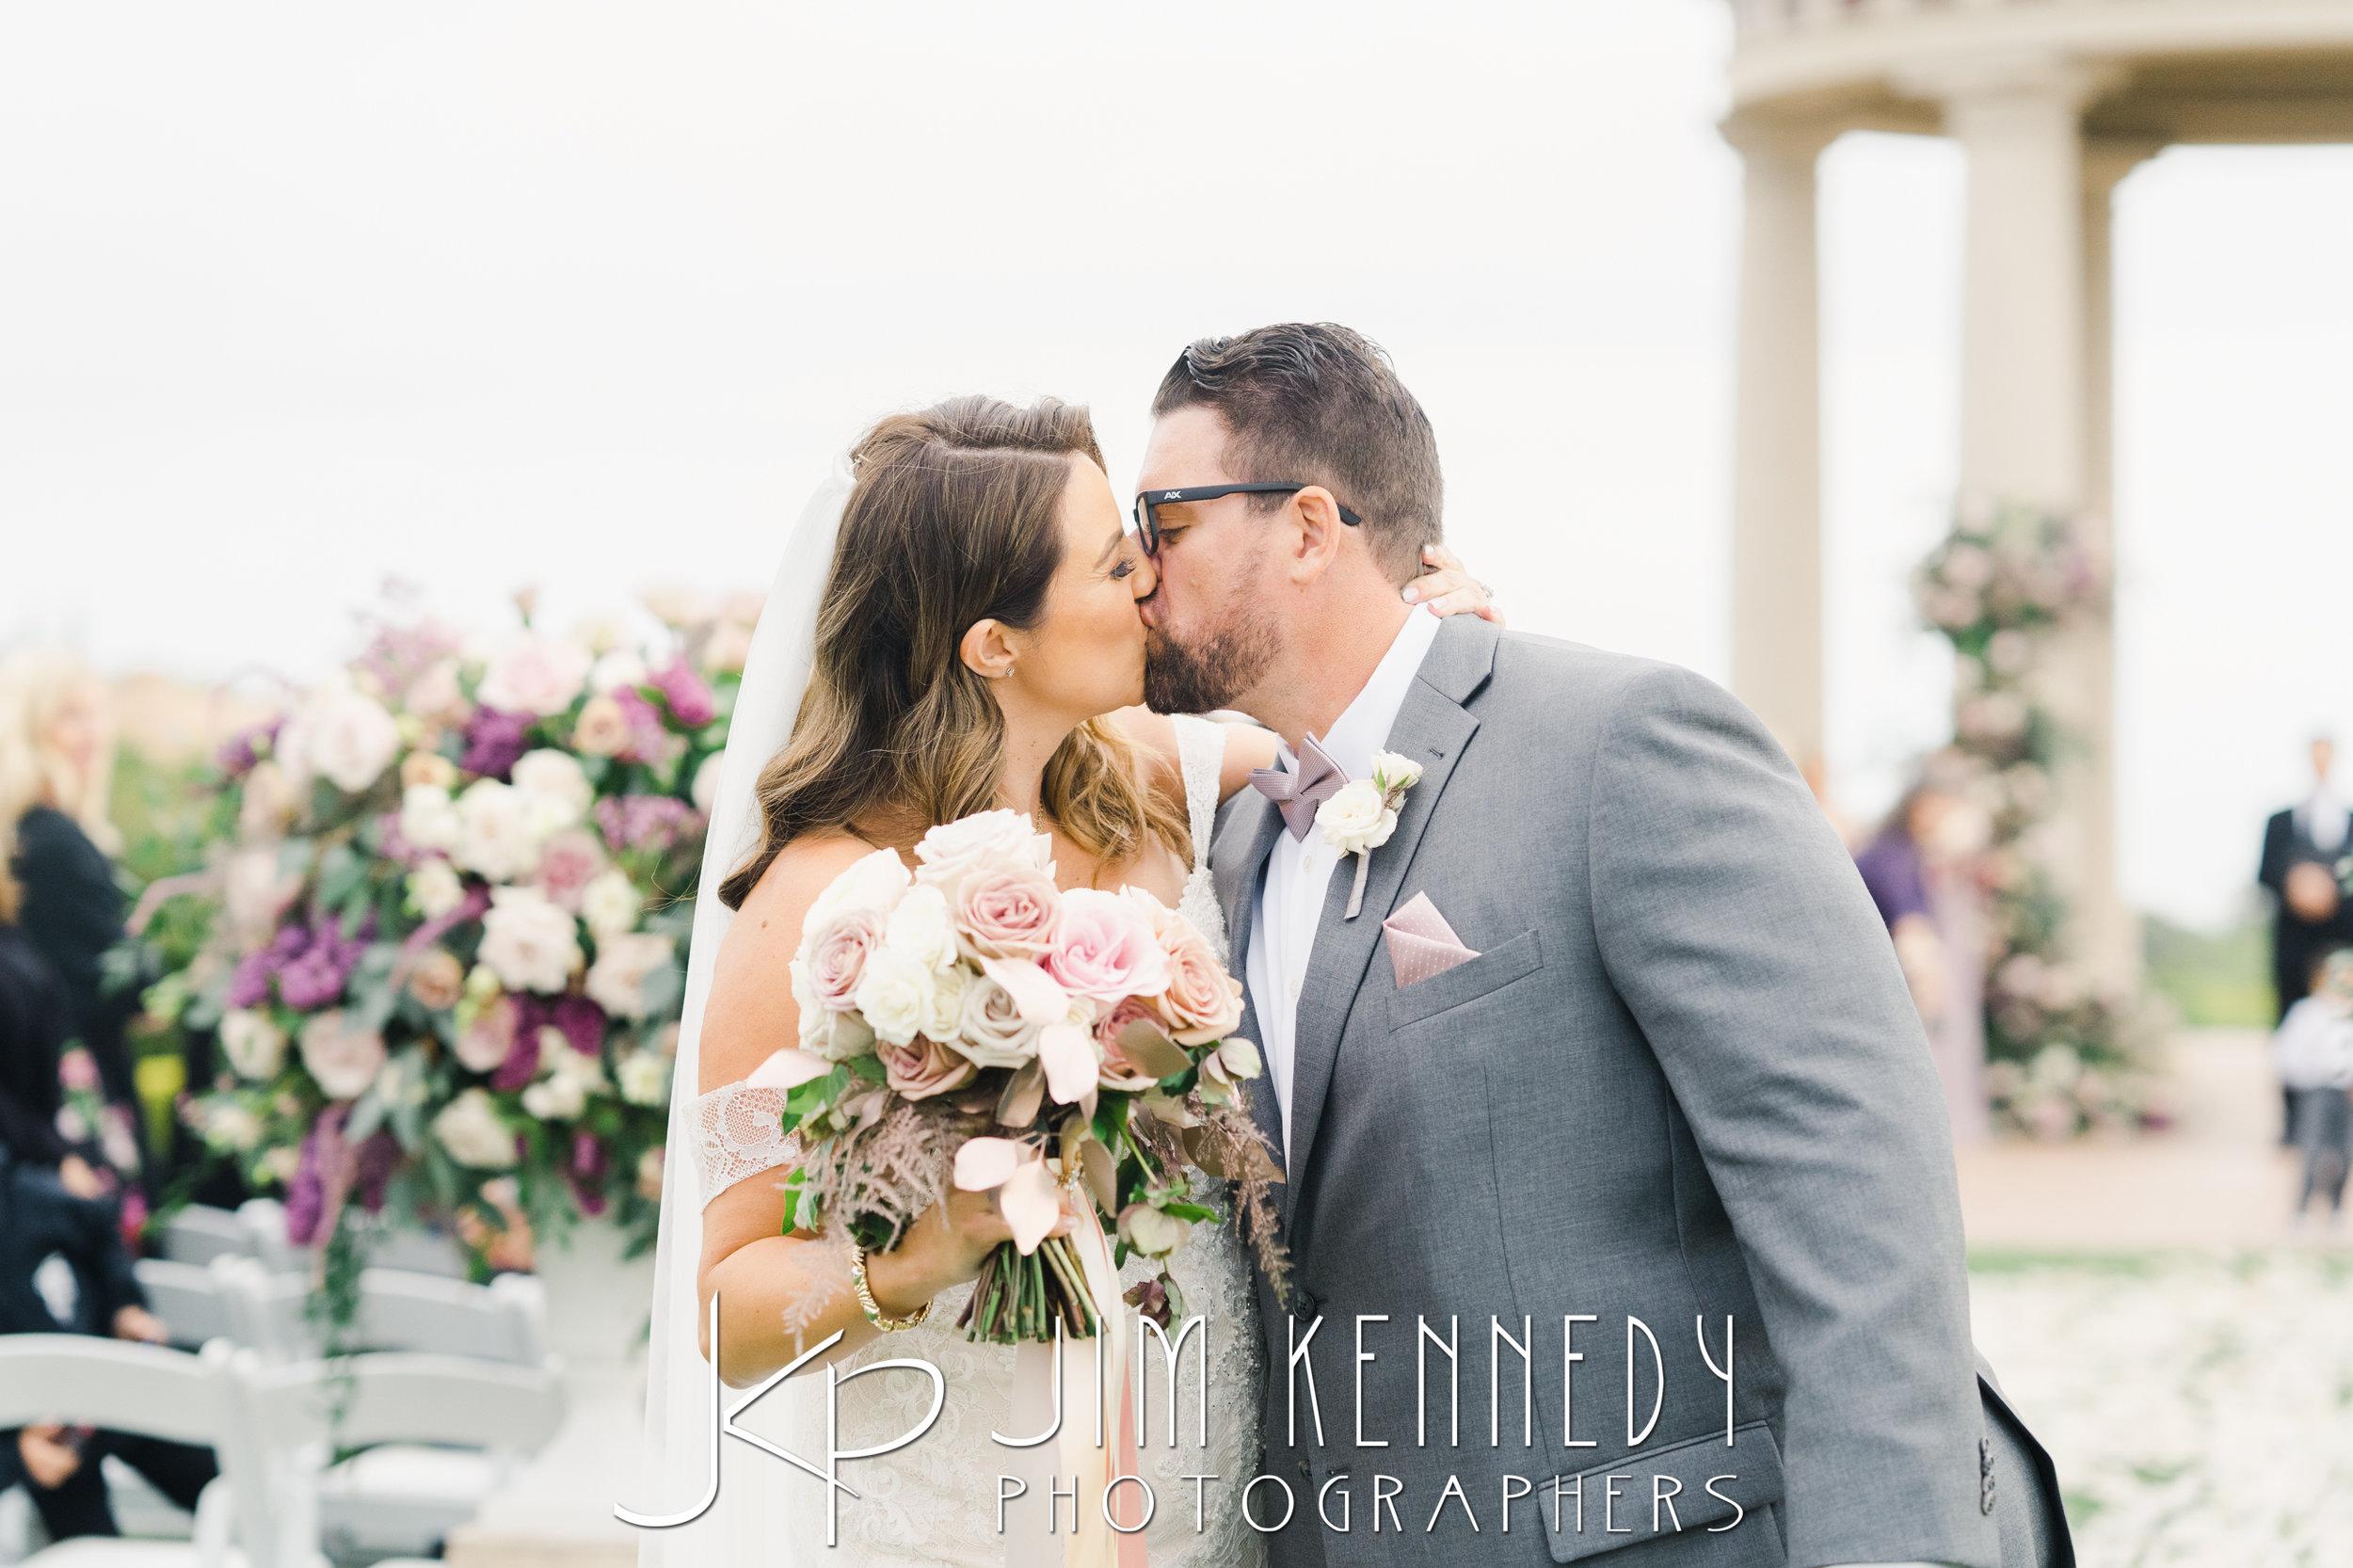 pelican-hill-wedding-jim-kenedy-photographers_0131.JPG